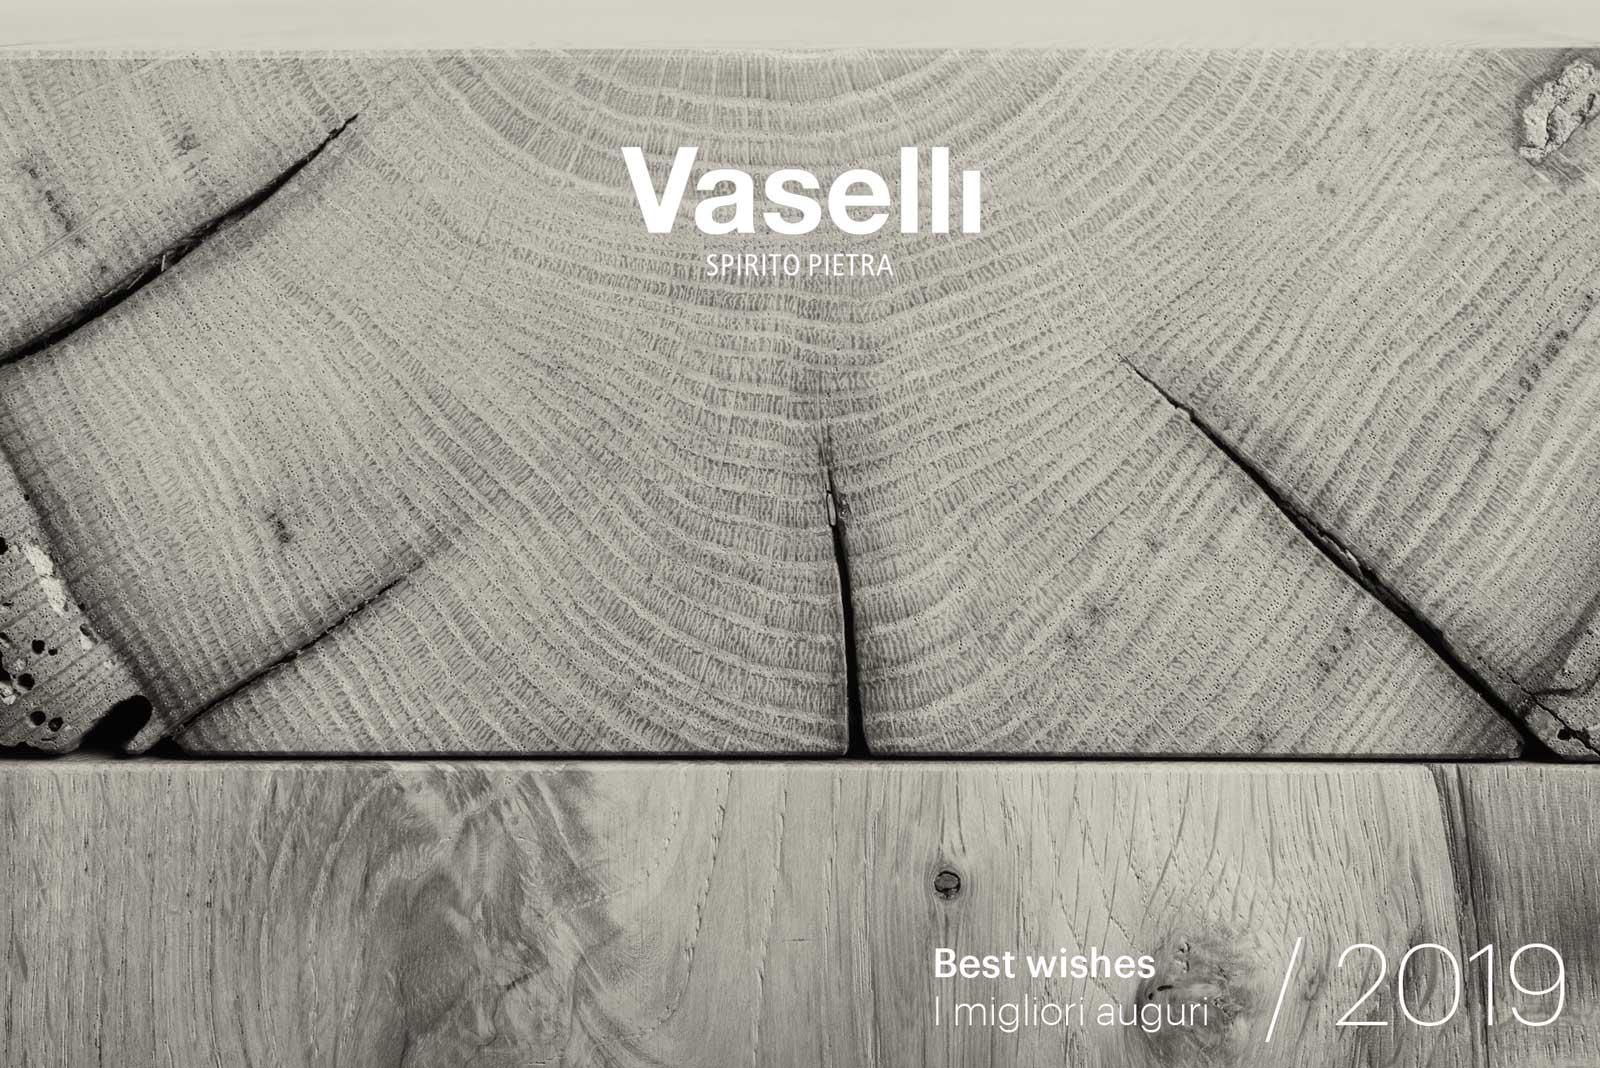 winter closure - chiusura invernale | 2018/2019 | Vaselli